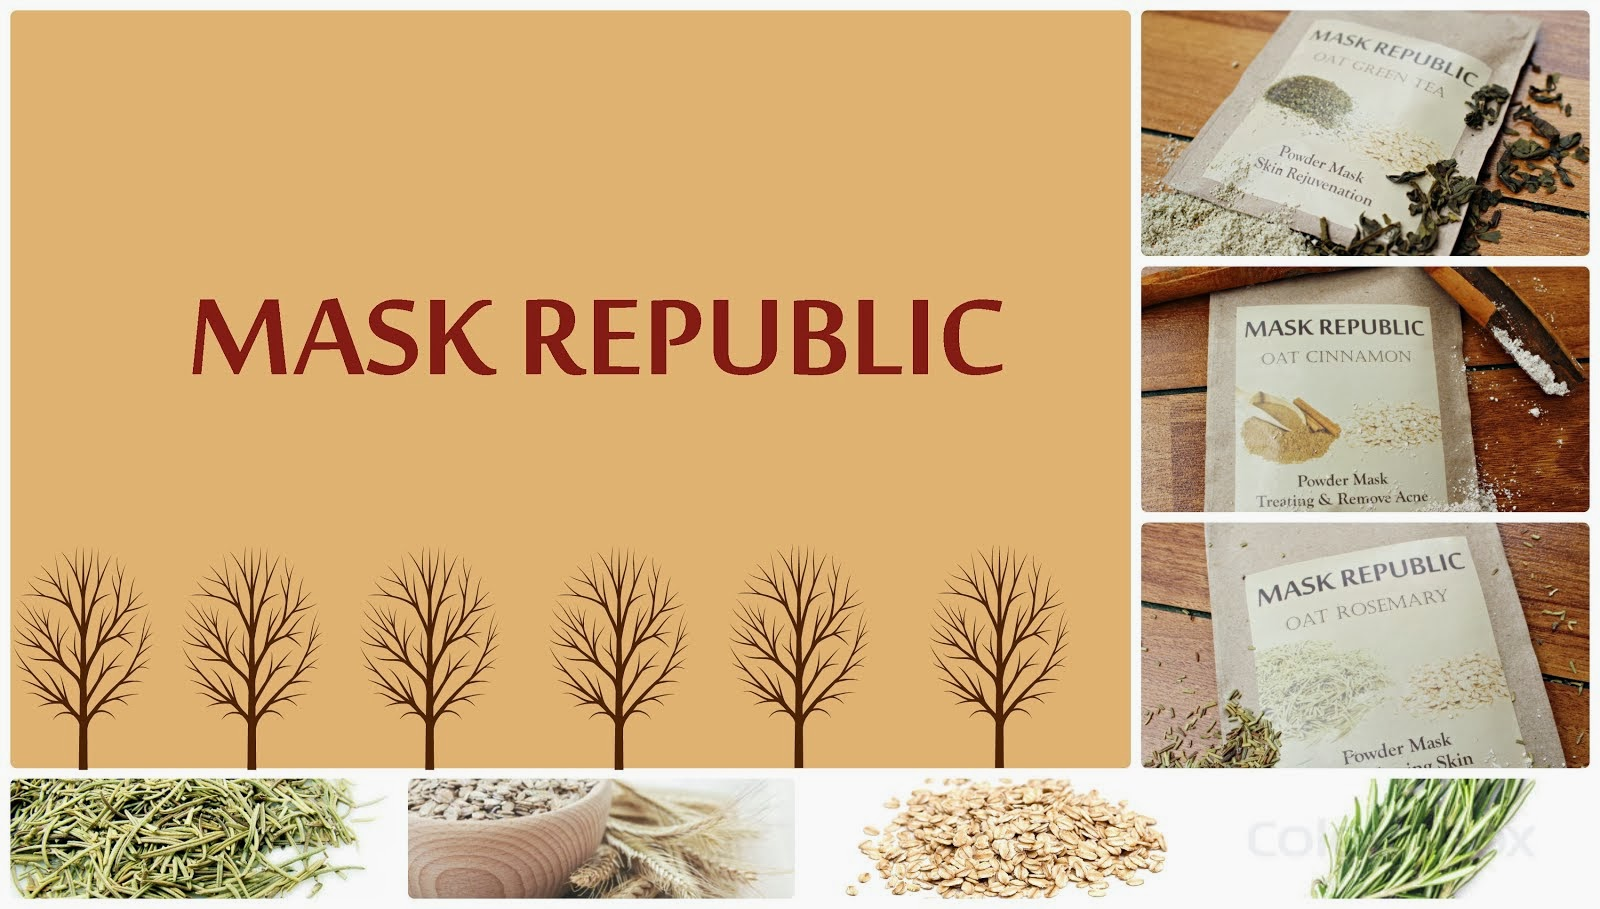 Mask Republic